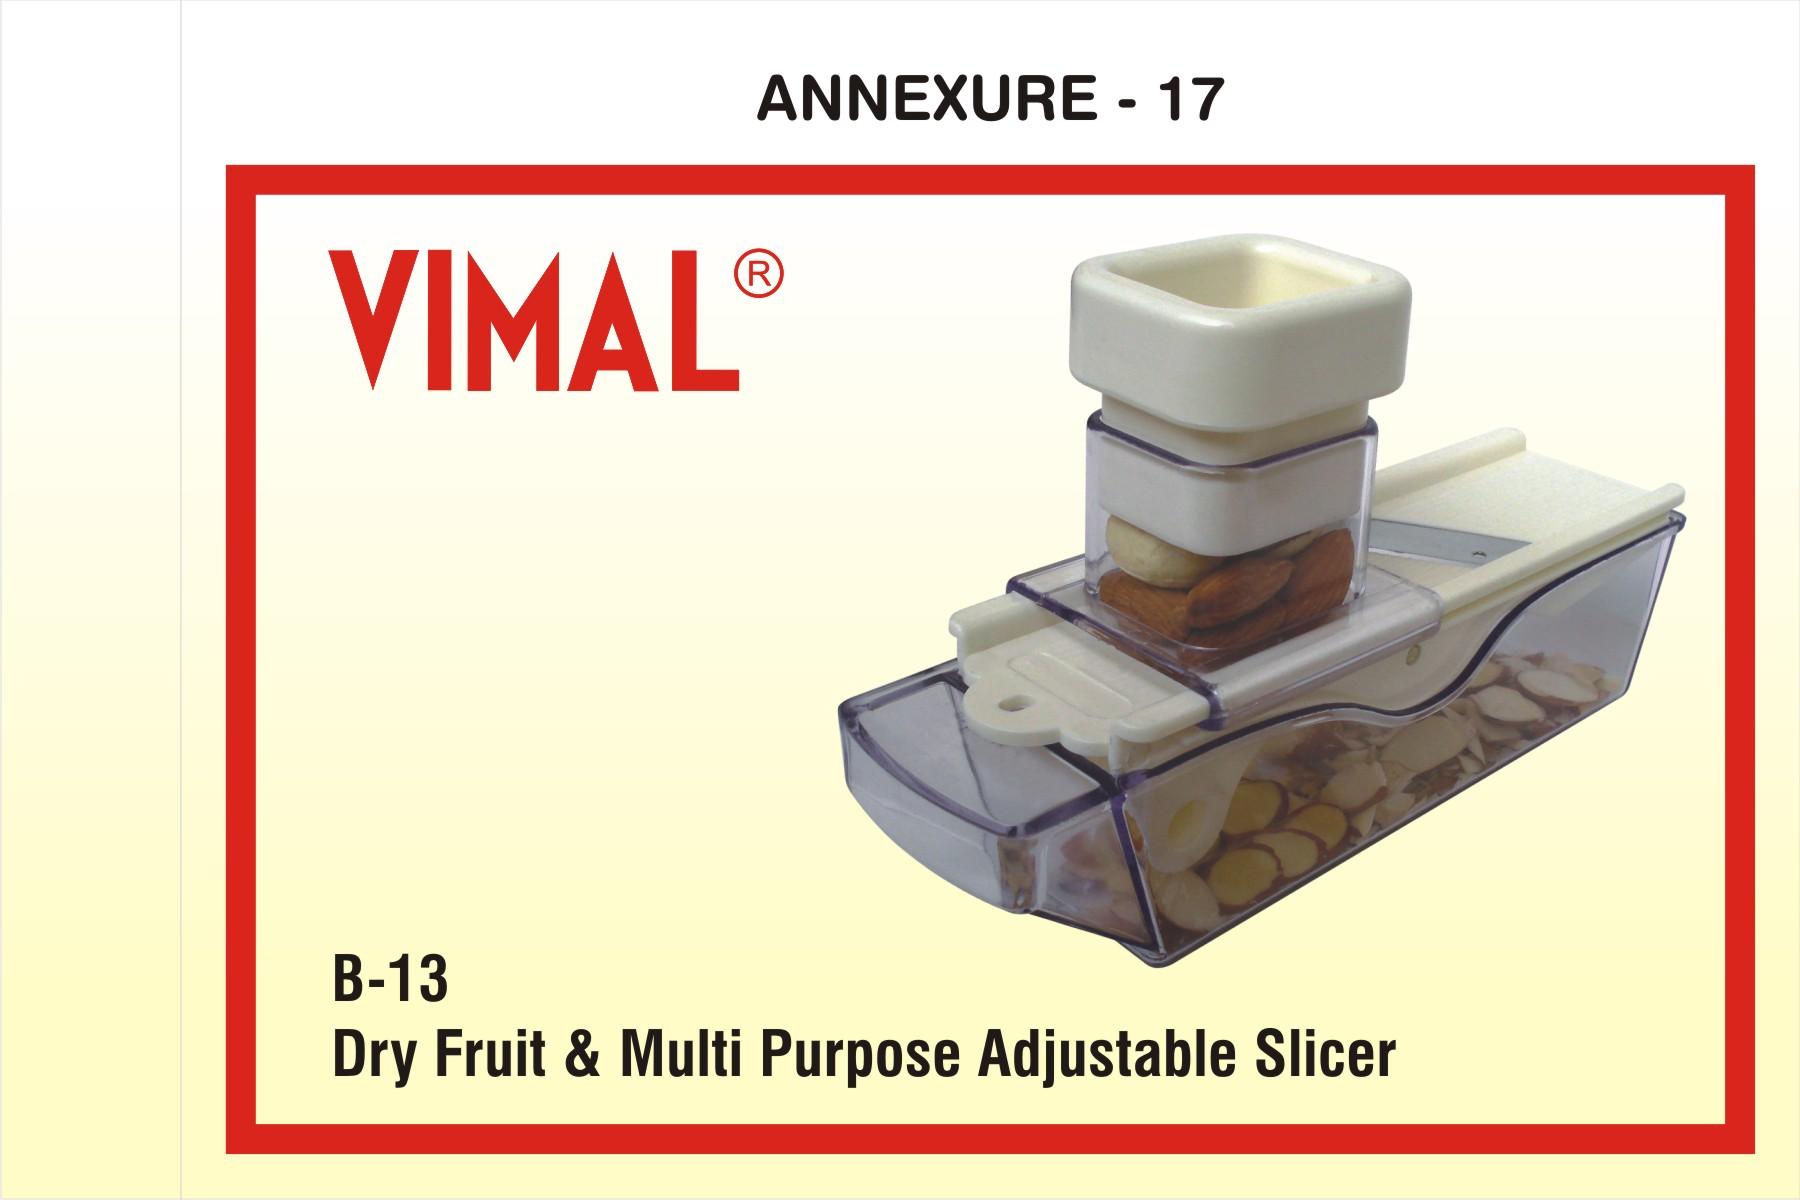 dry fruit multi purpose adjustable slicer 658018 dry fruit & multi purpose adjustable slicer manufacturer in rajkot